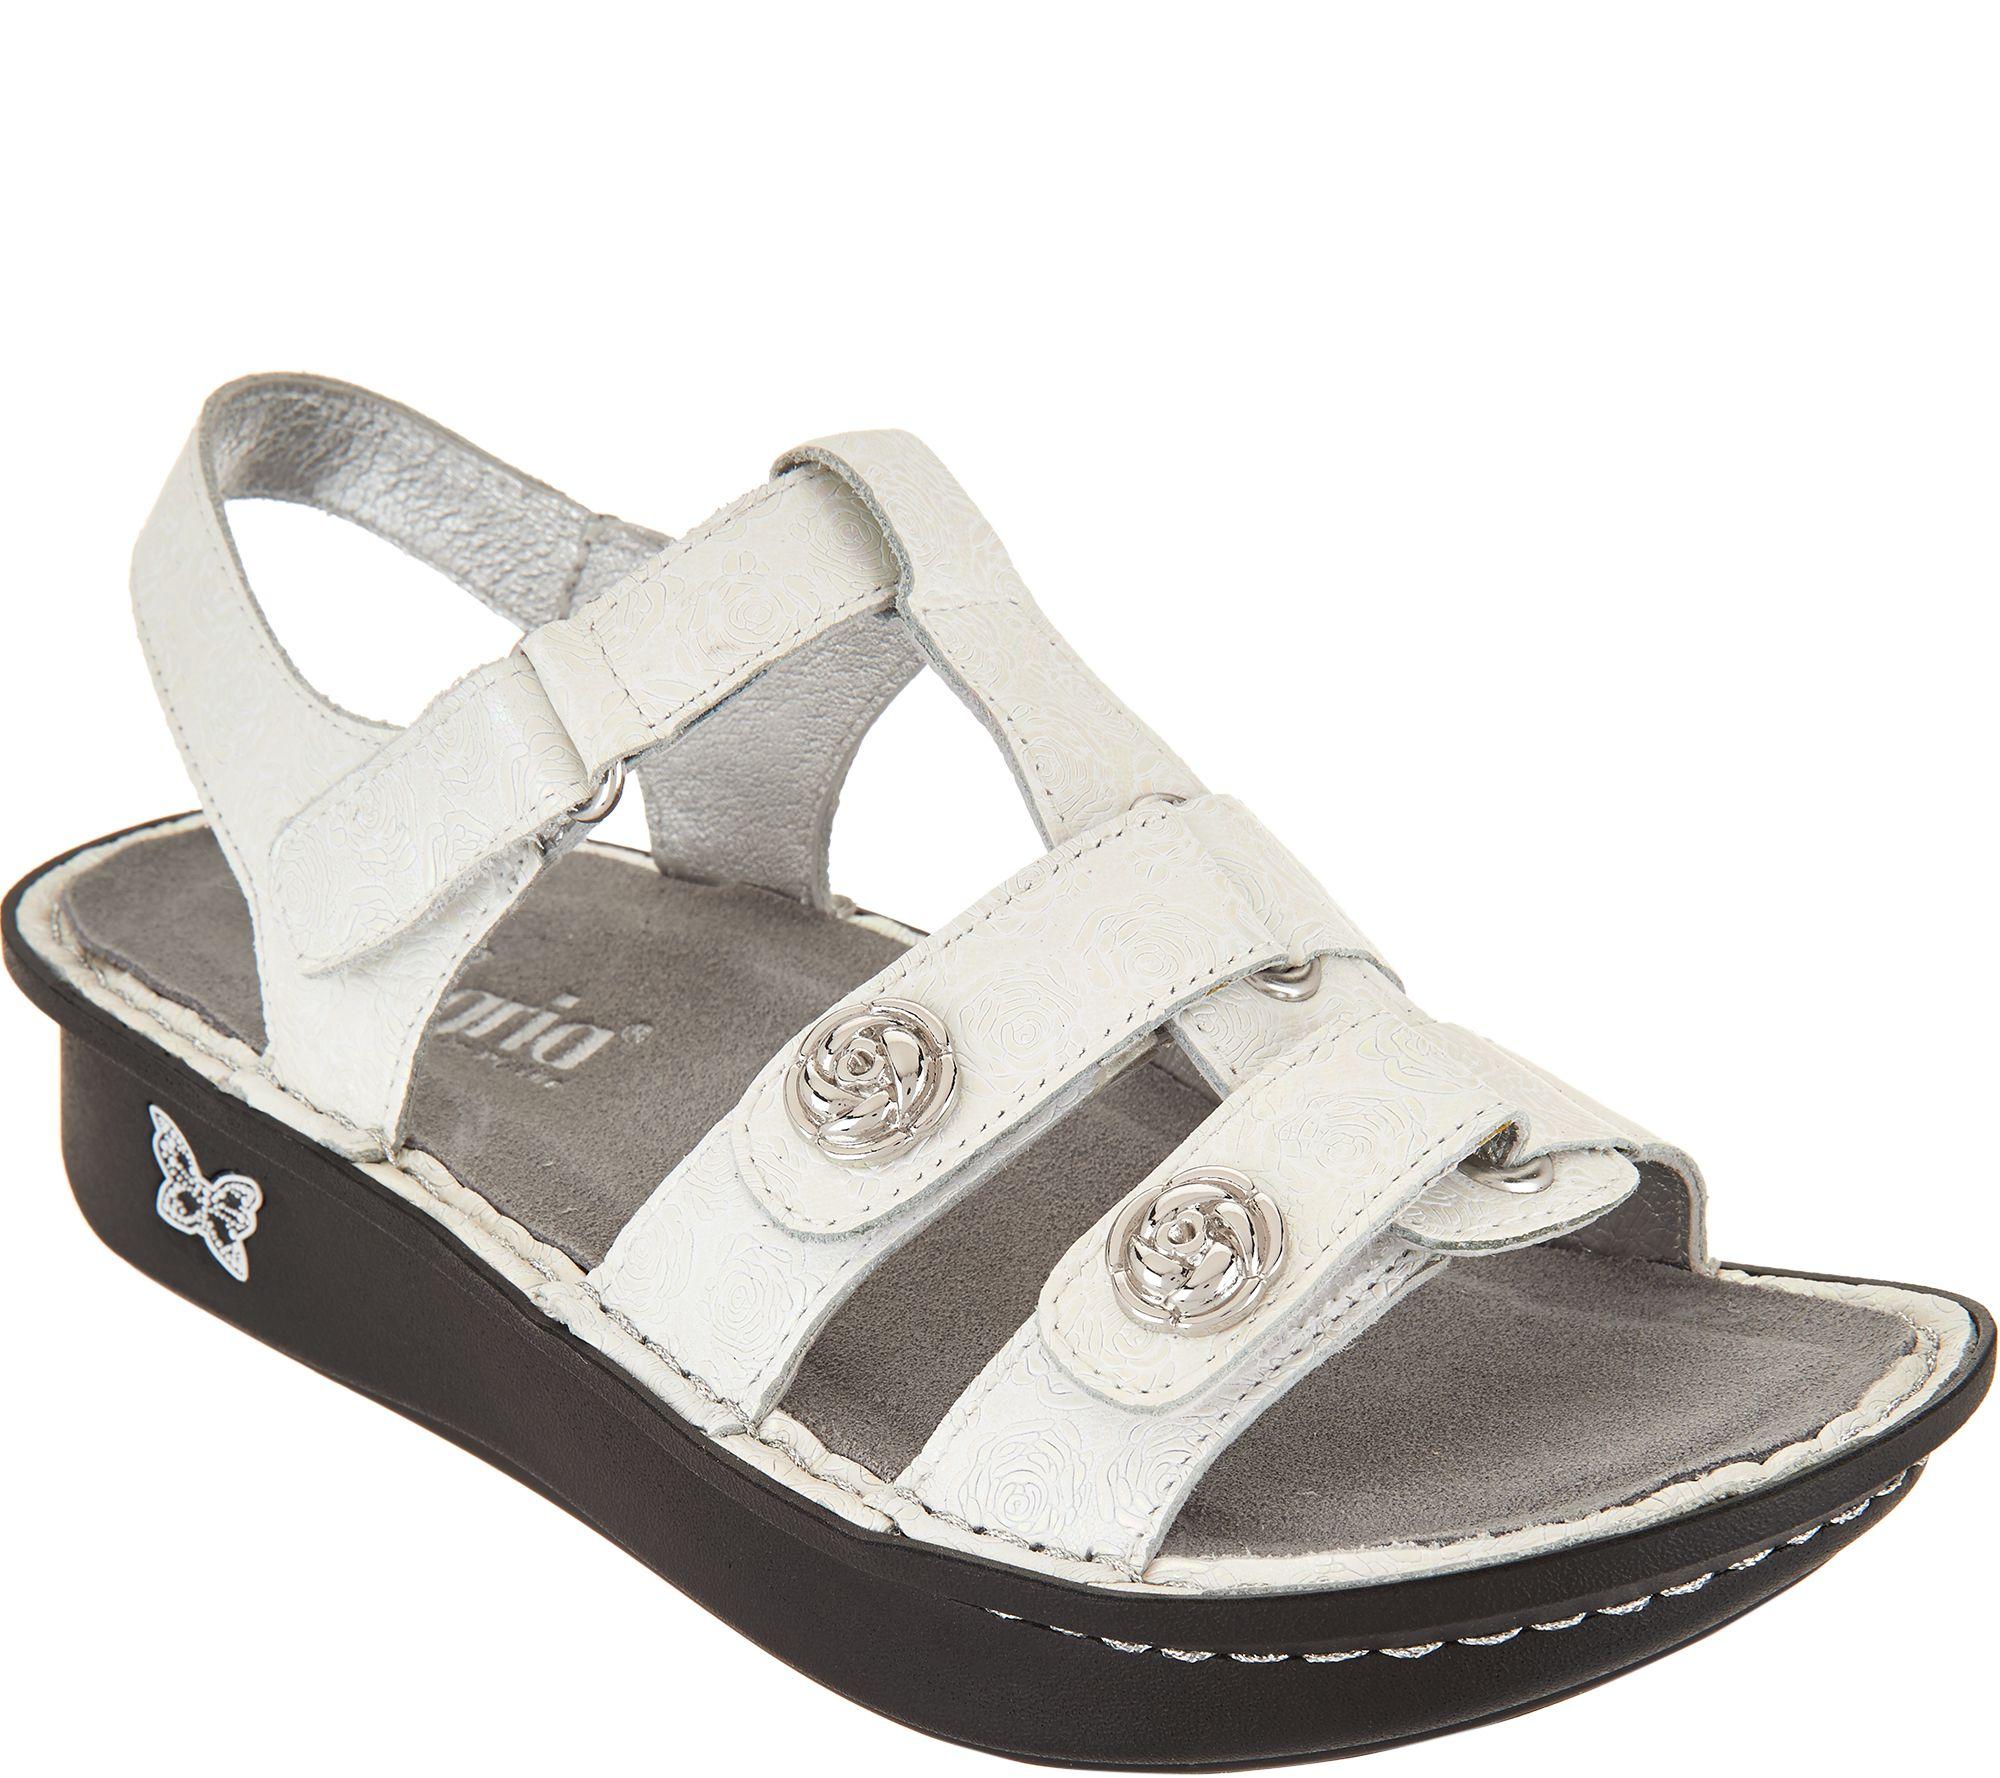 b43392236b403c Alegria Leather Multi-Strap Sandals w  Backstrap - Kleo - Page 1 — QVC.com